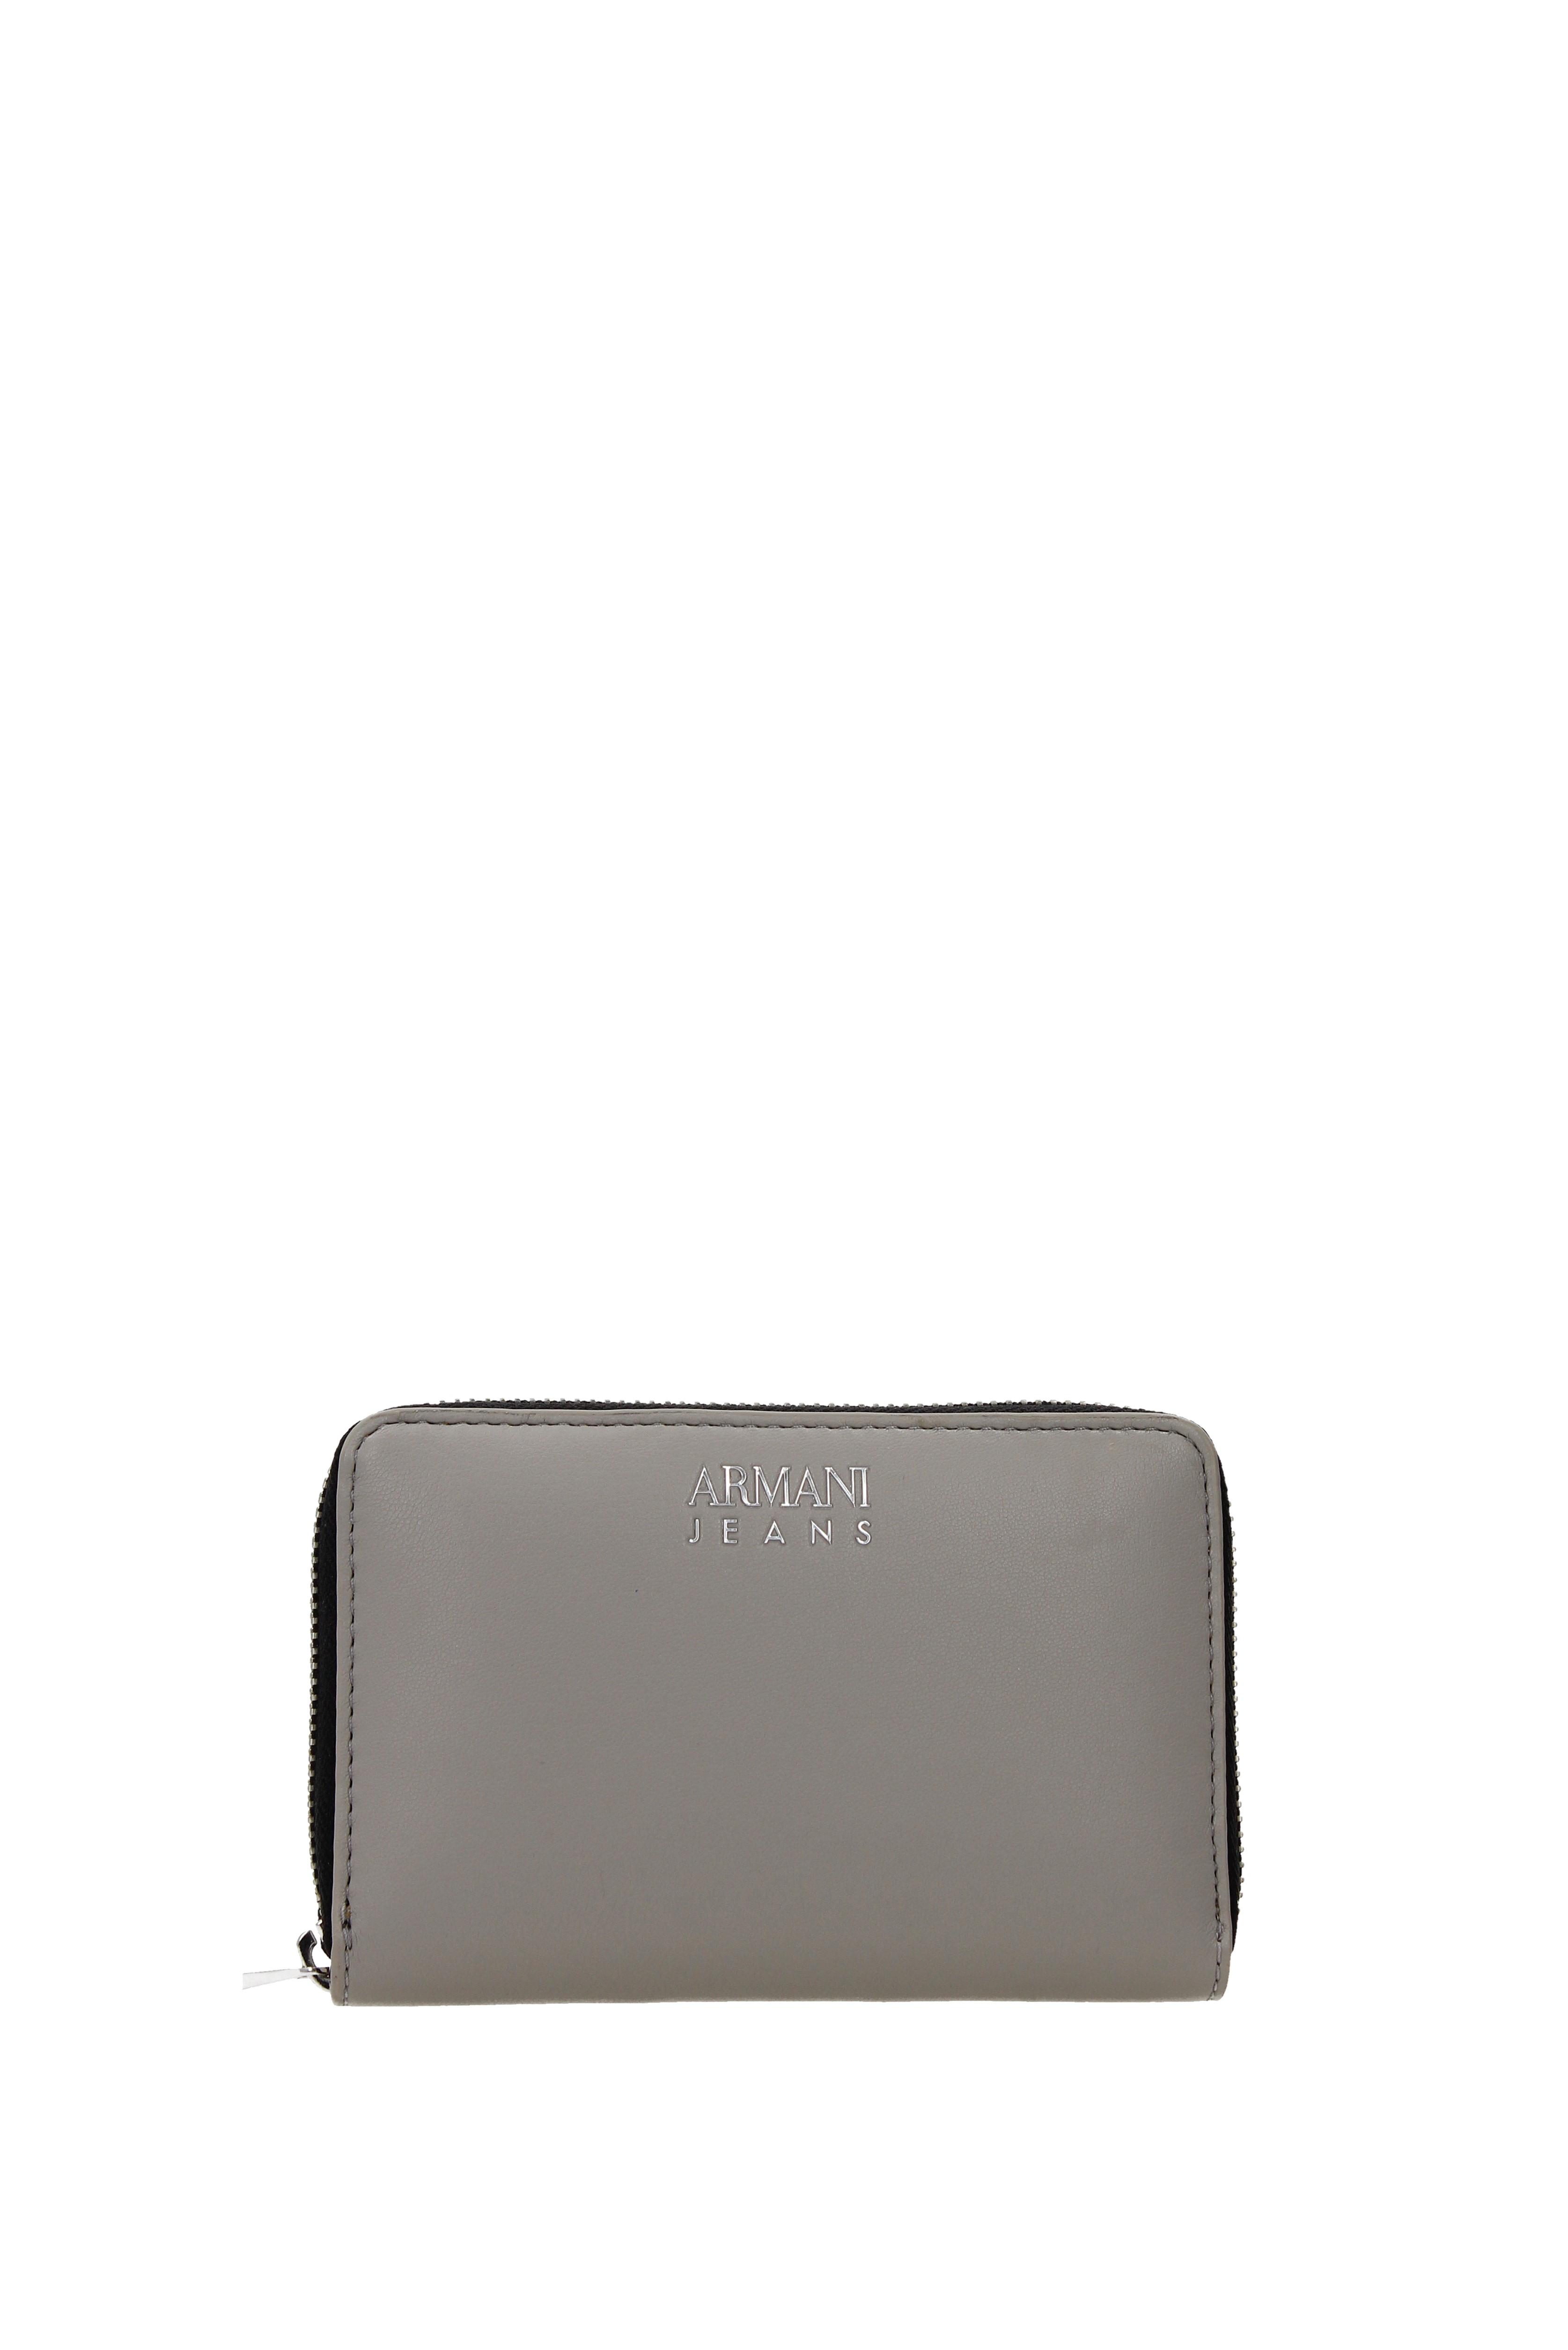 Brieftasche-Armani-Jeans-Damen-Polyester-9280587A789